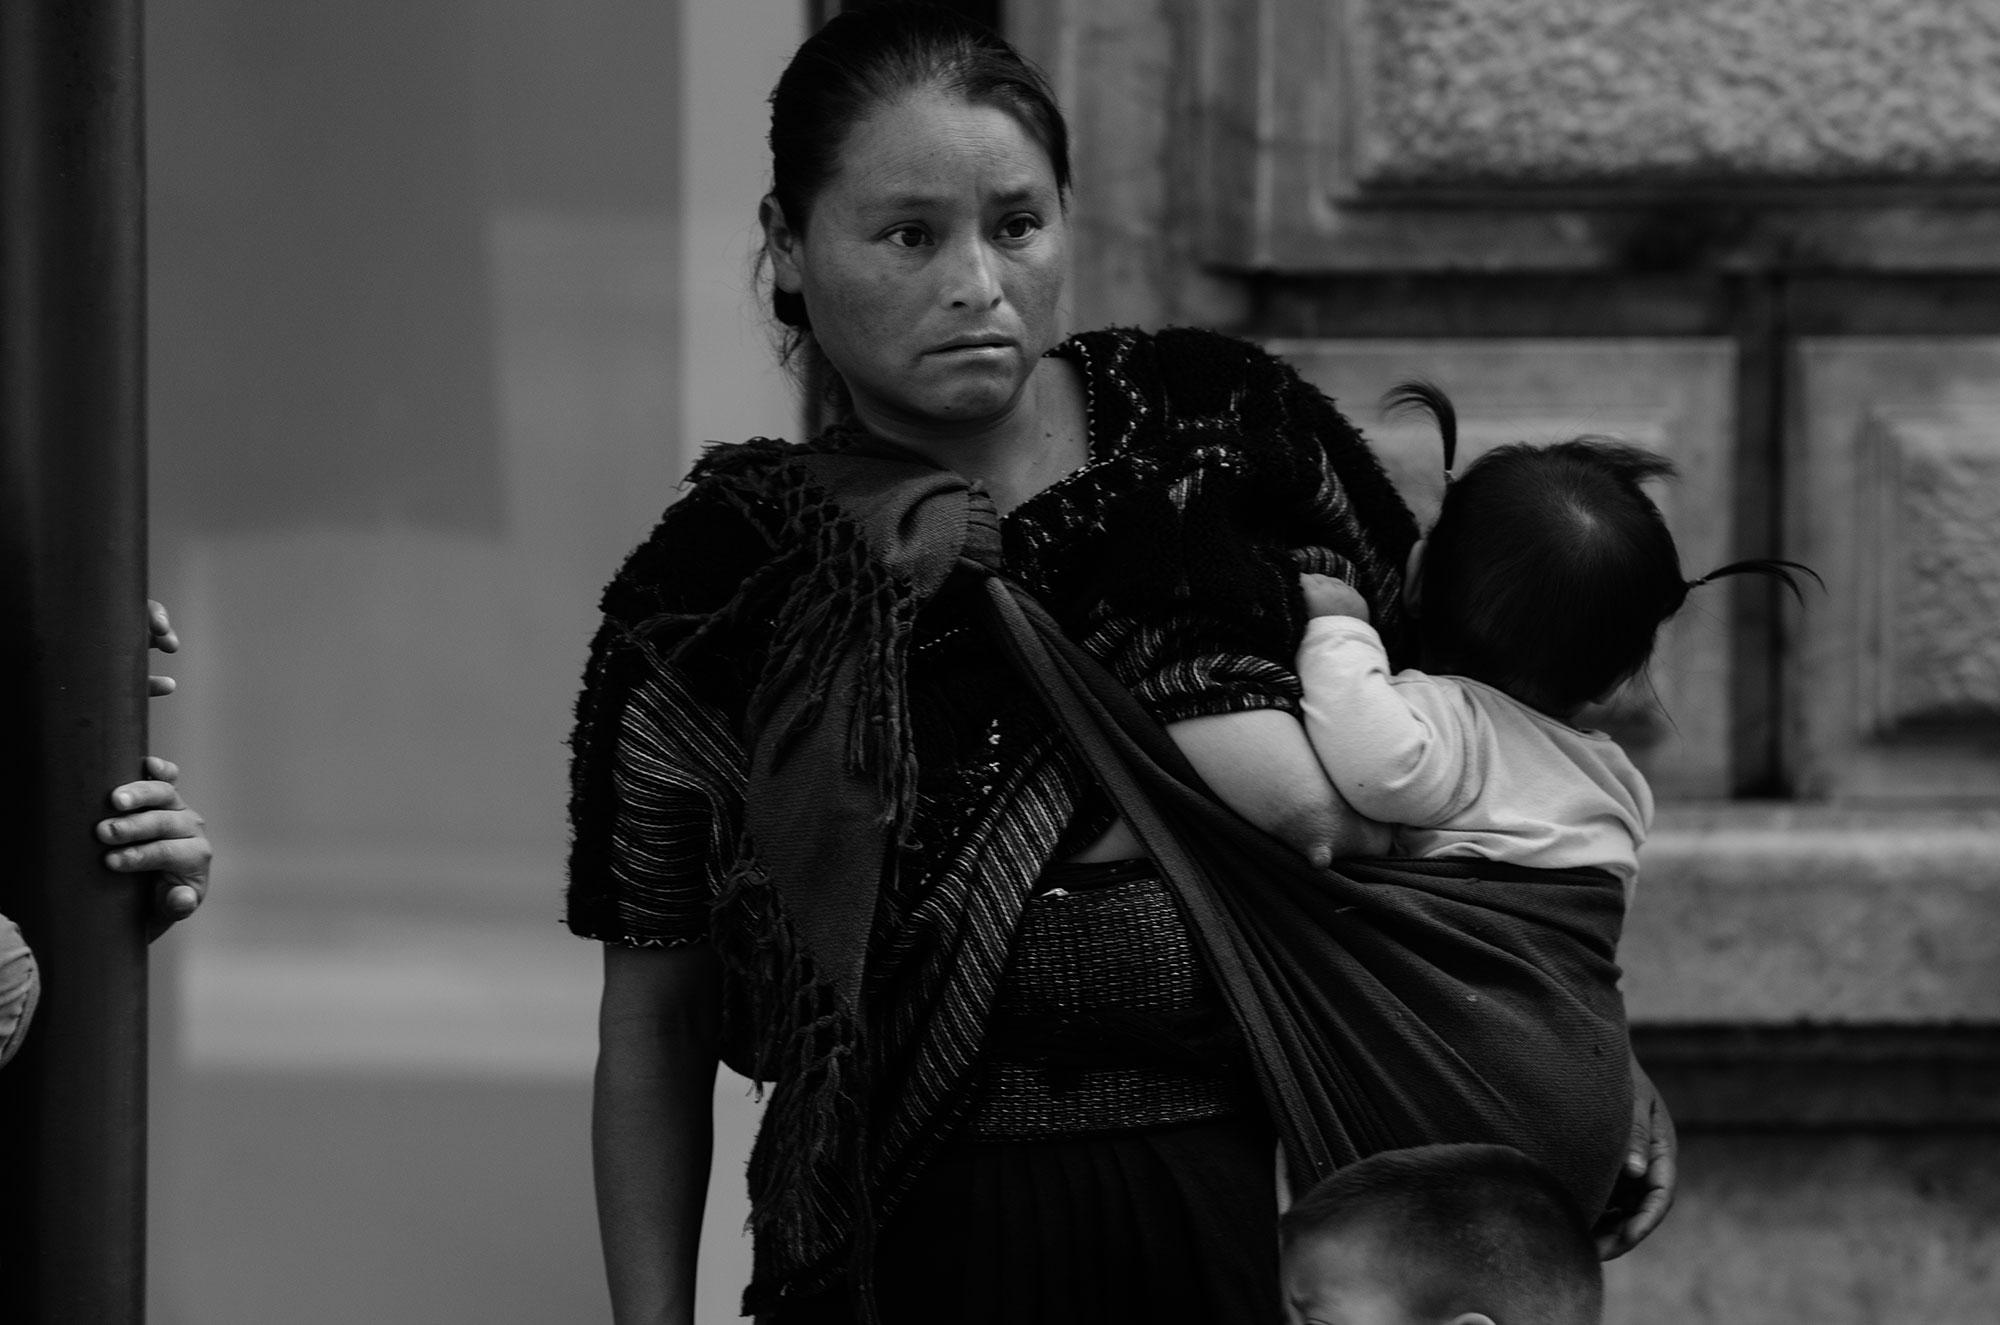 Motherhood . Mexico City, 2017.